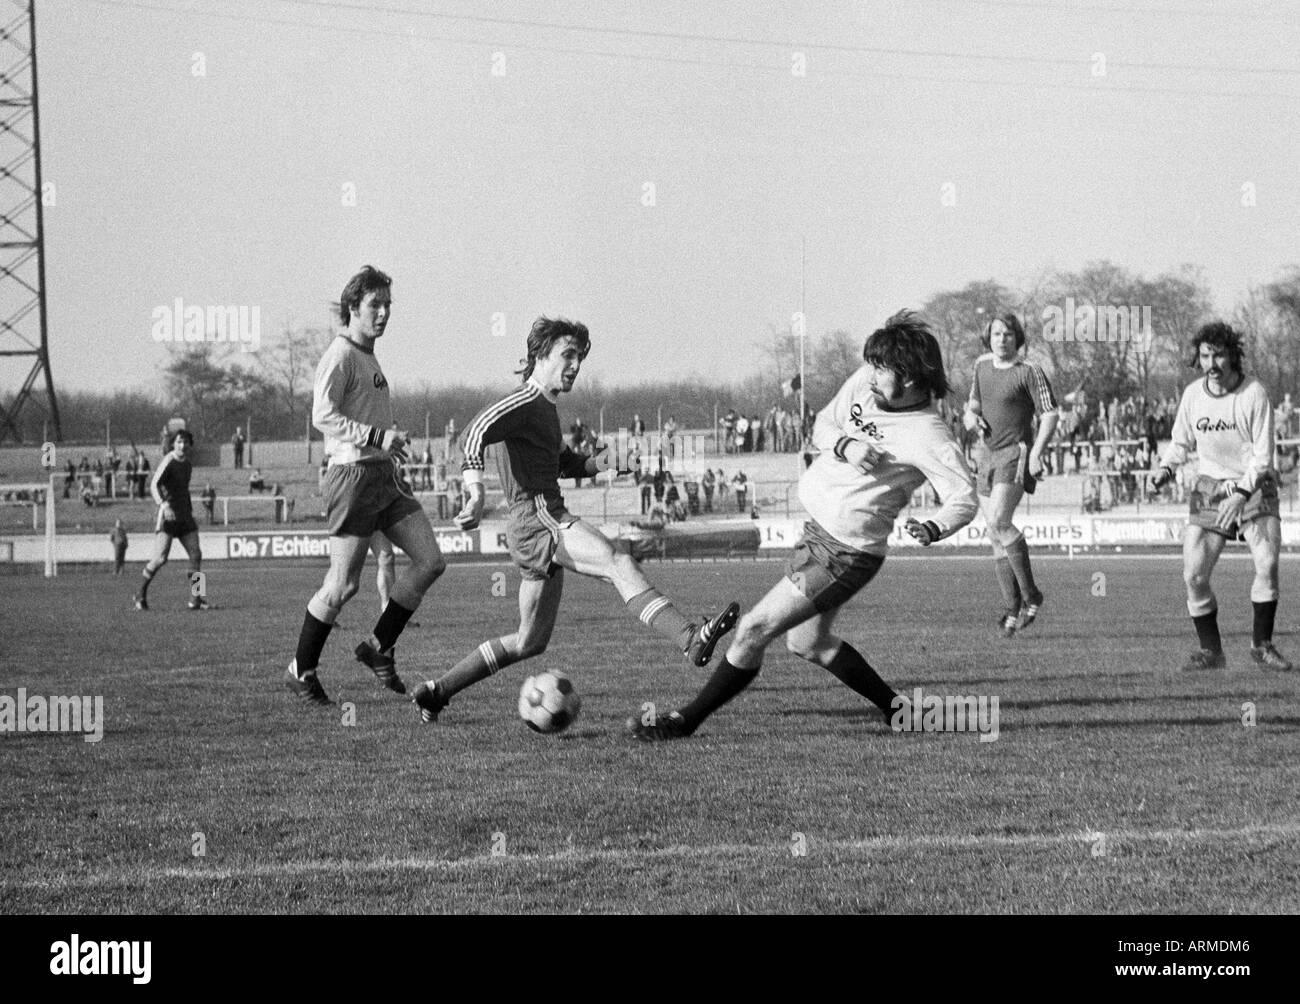 football, Regionalliga West, 1973/1974, Niederrhein Stadium in Oberhausen, Rot-Weiss Oberhausen versus Westfalia Herne 5:0, scene of the match, f.l.t.r. a Herne player, an Oberhausen player, a Herne player, Lothar Kobluhn (RWO), a Herne player - Stock Image